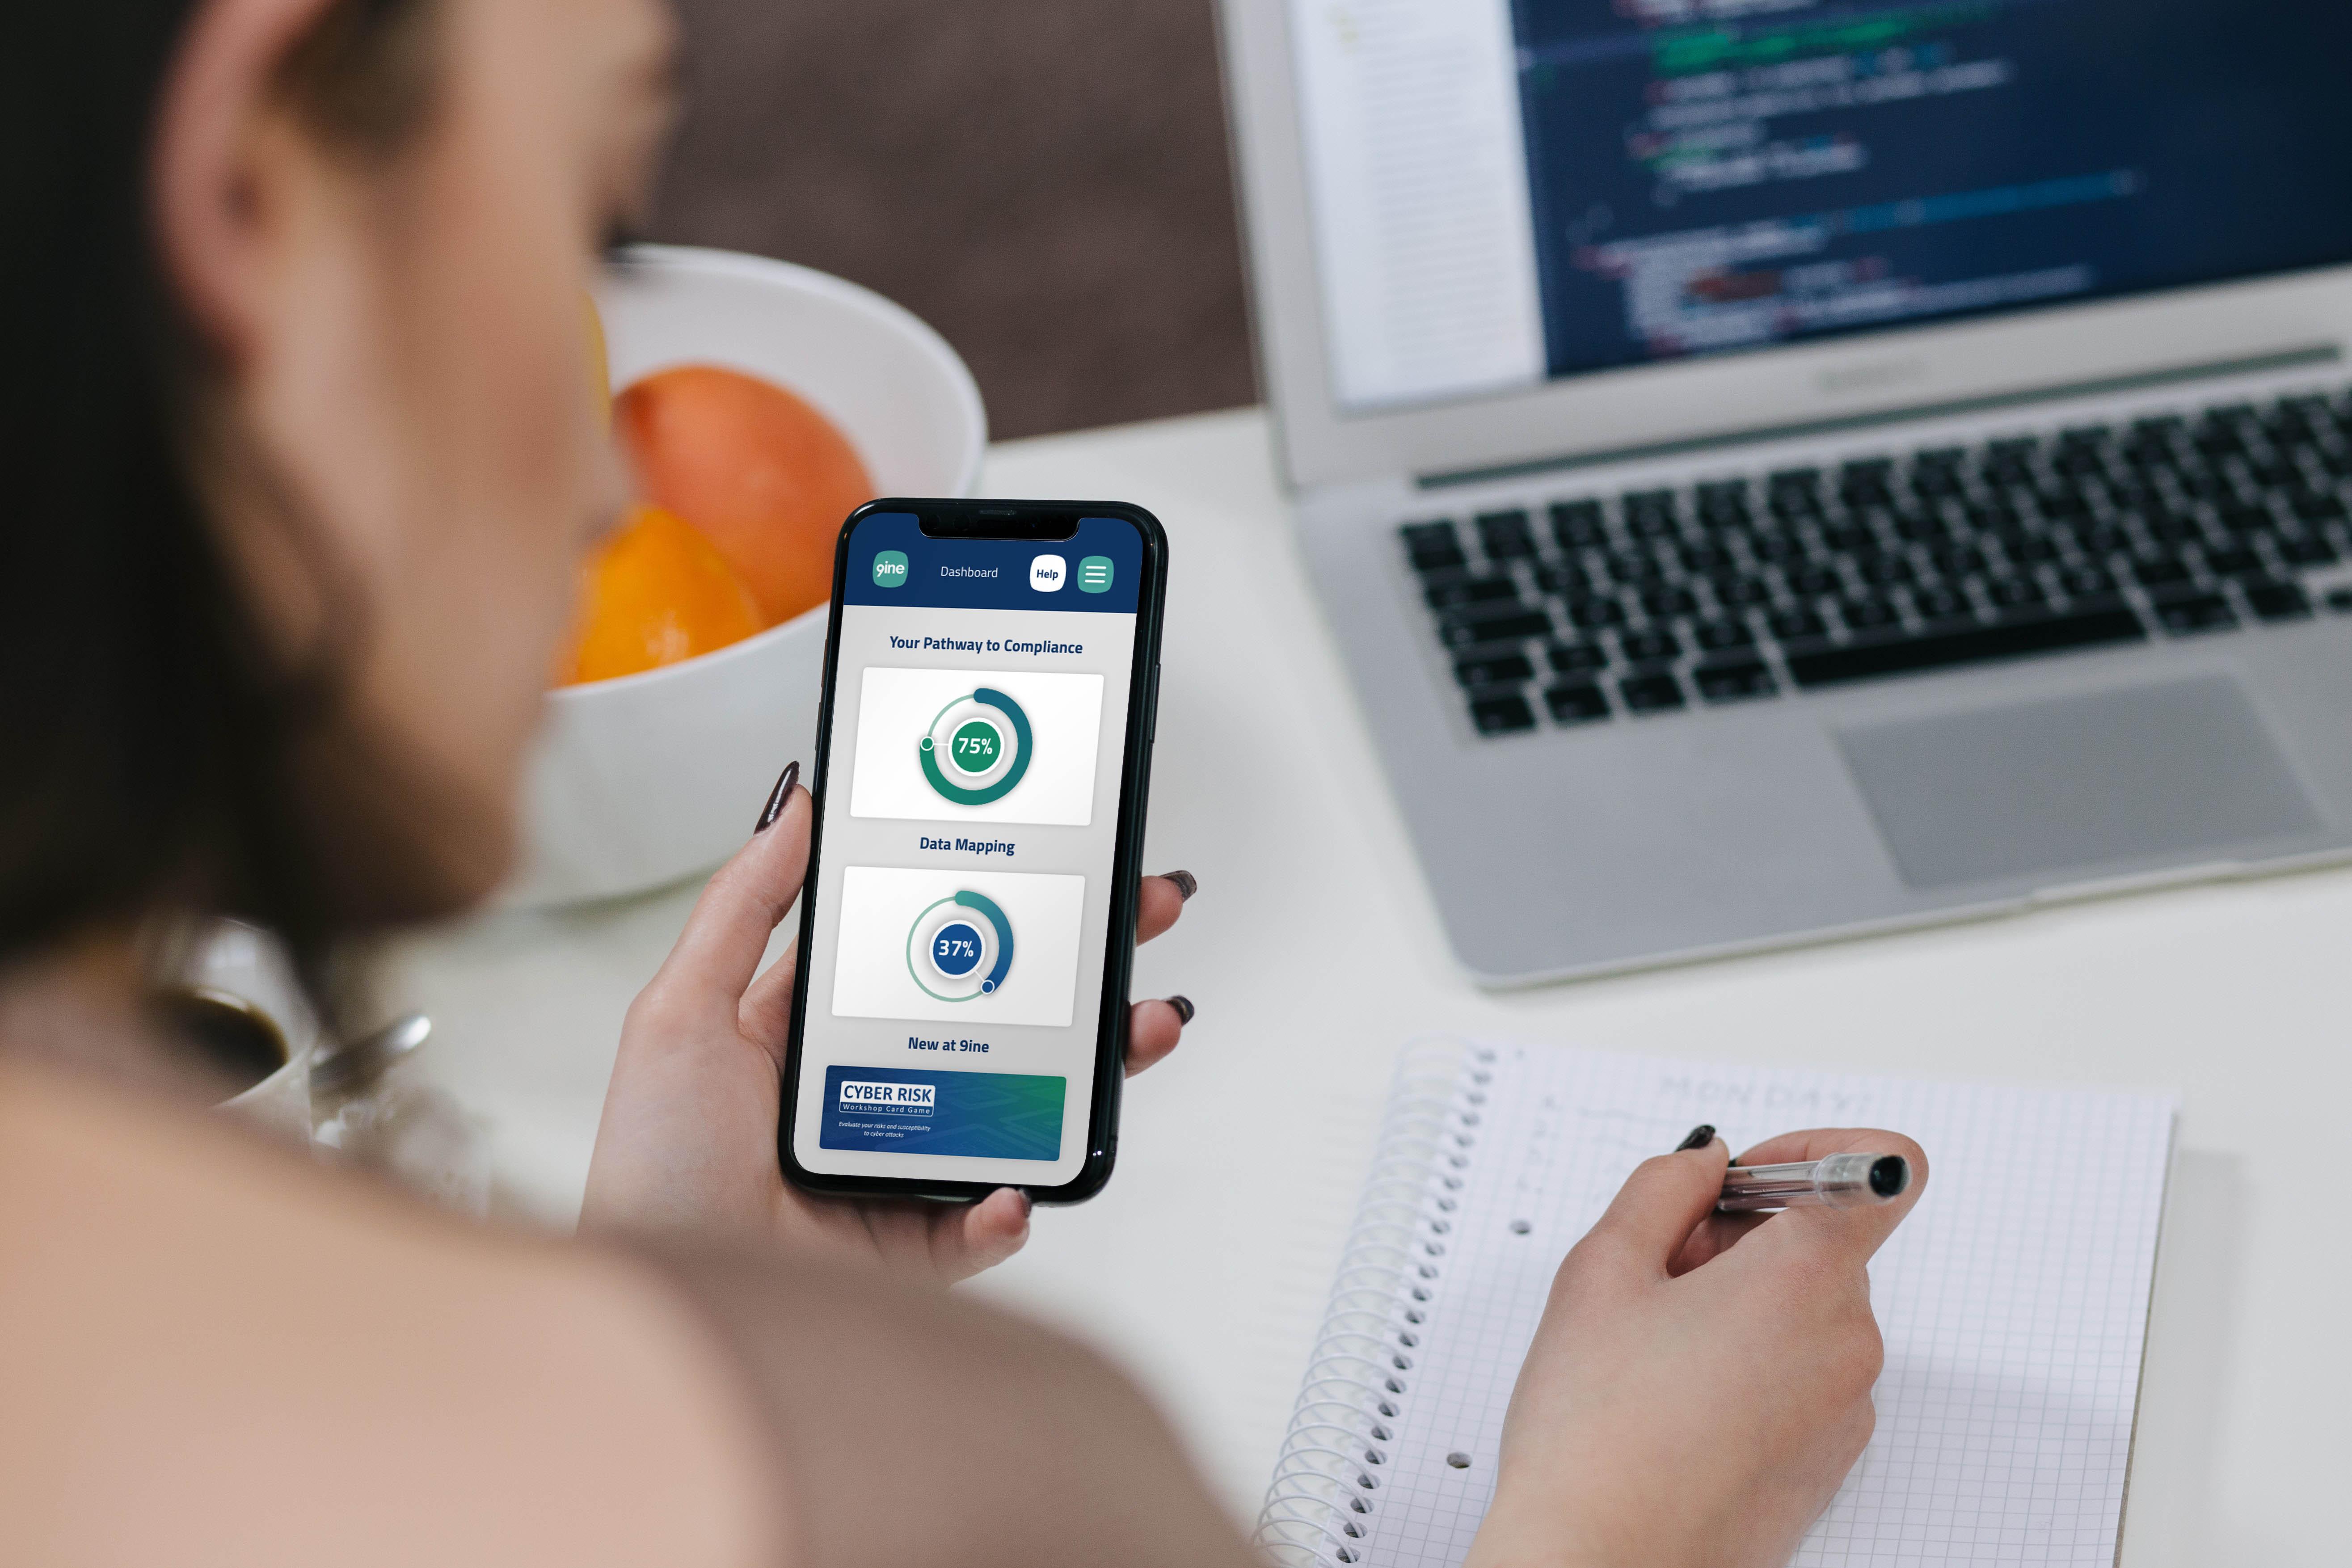 Woman using phone showing 9ine Web App